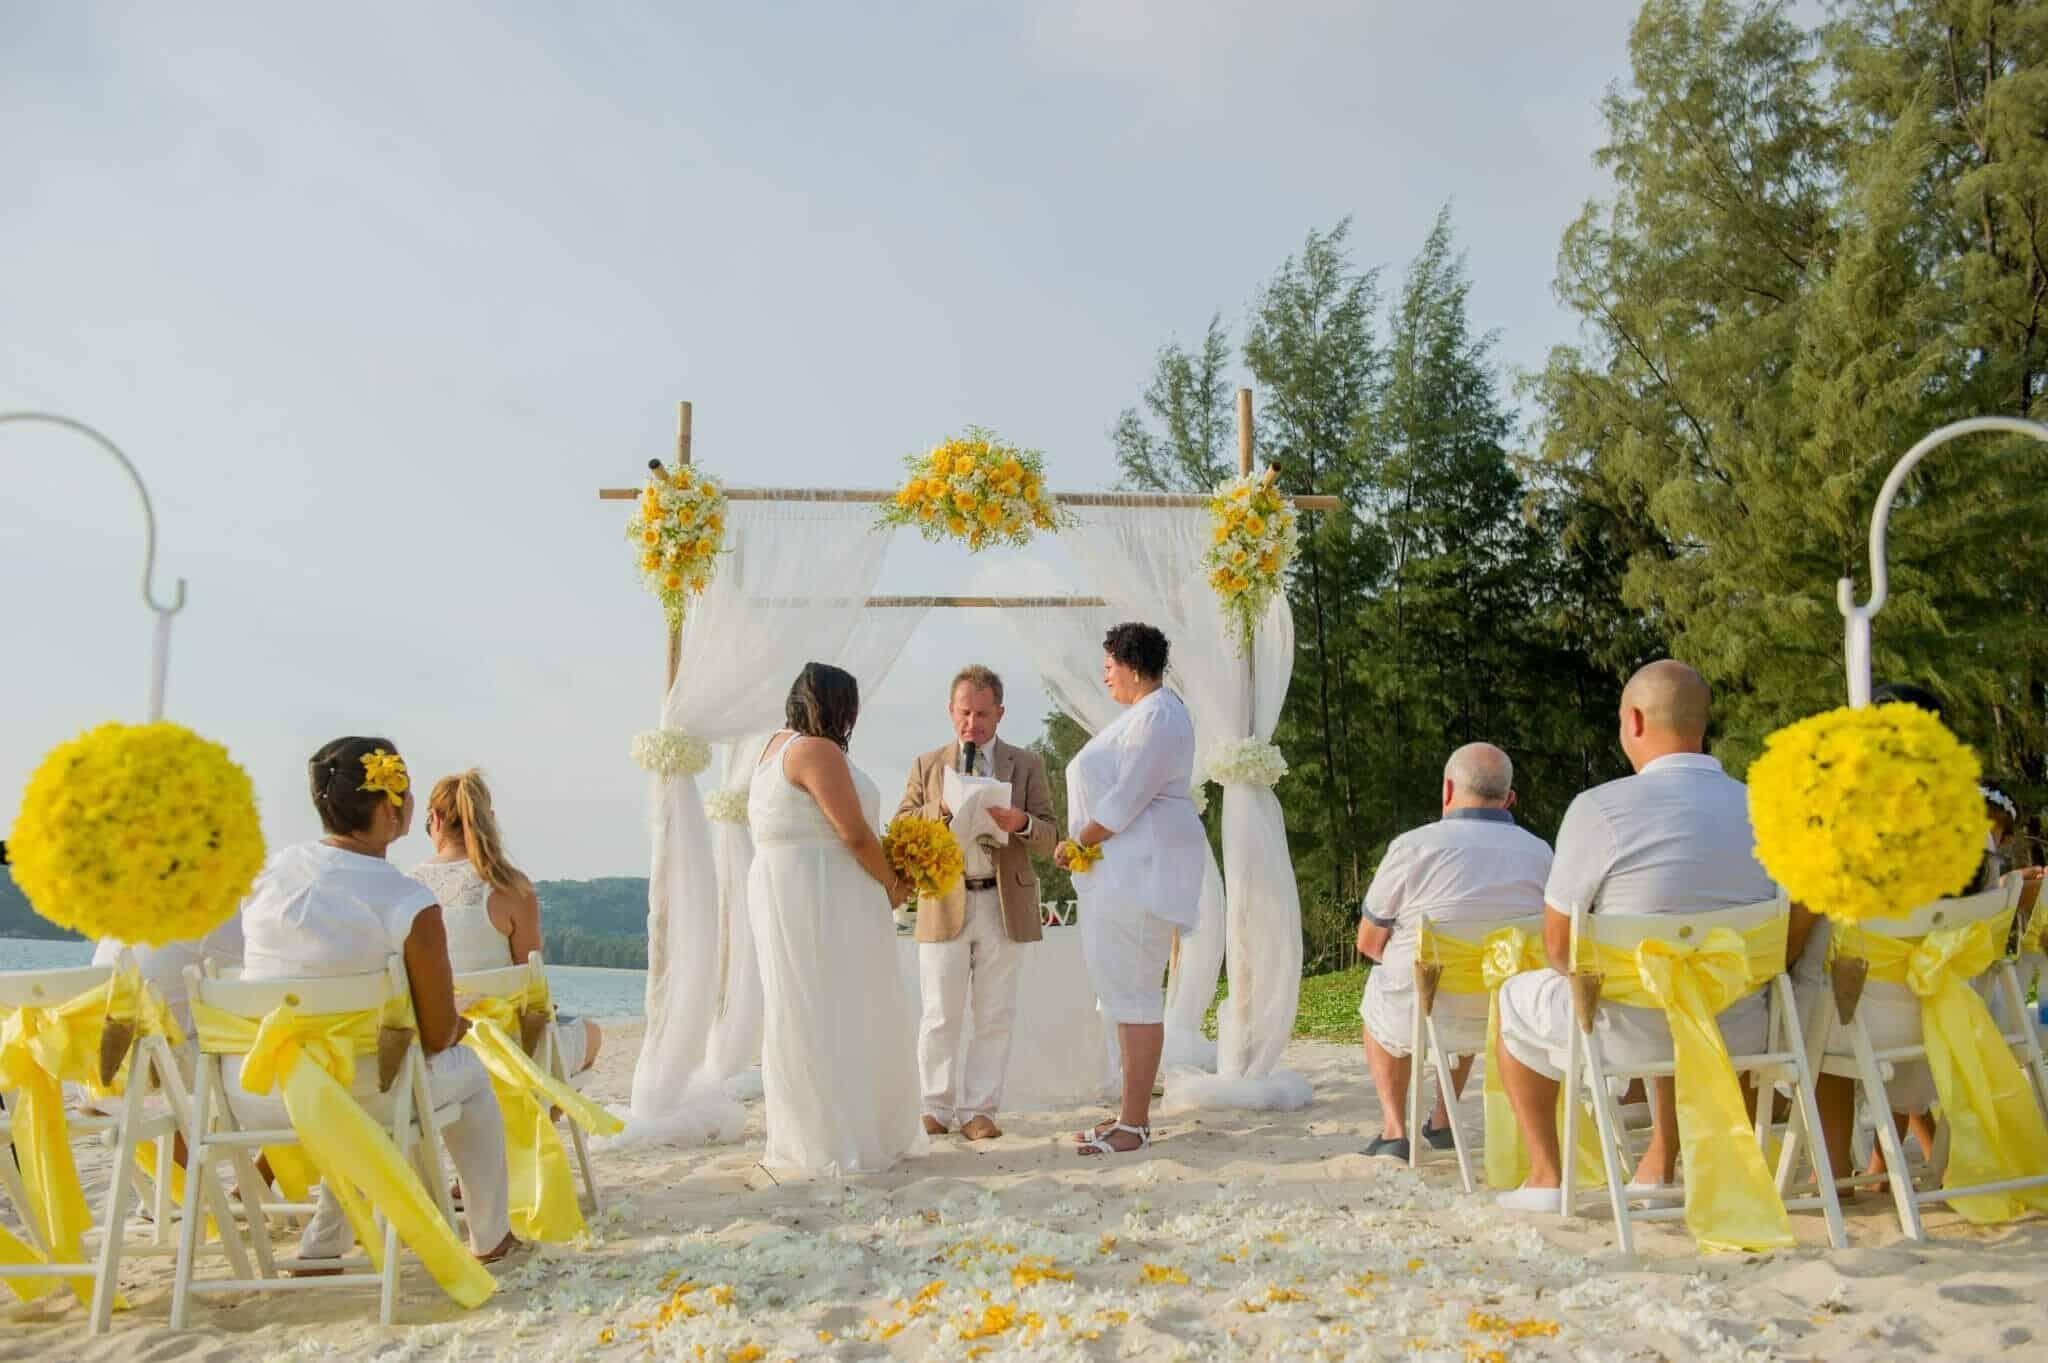 Phuket beach marriage celebrant (6)